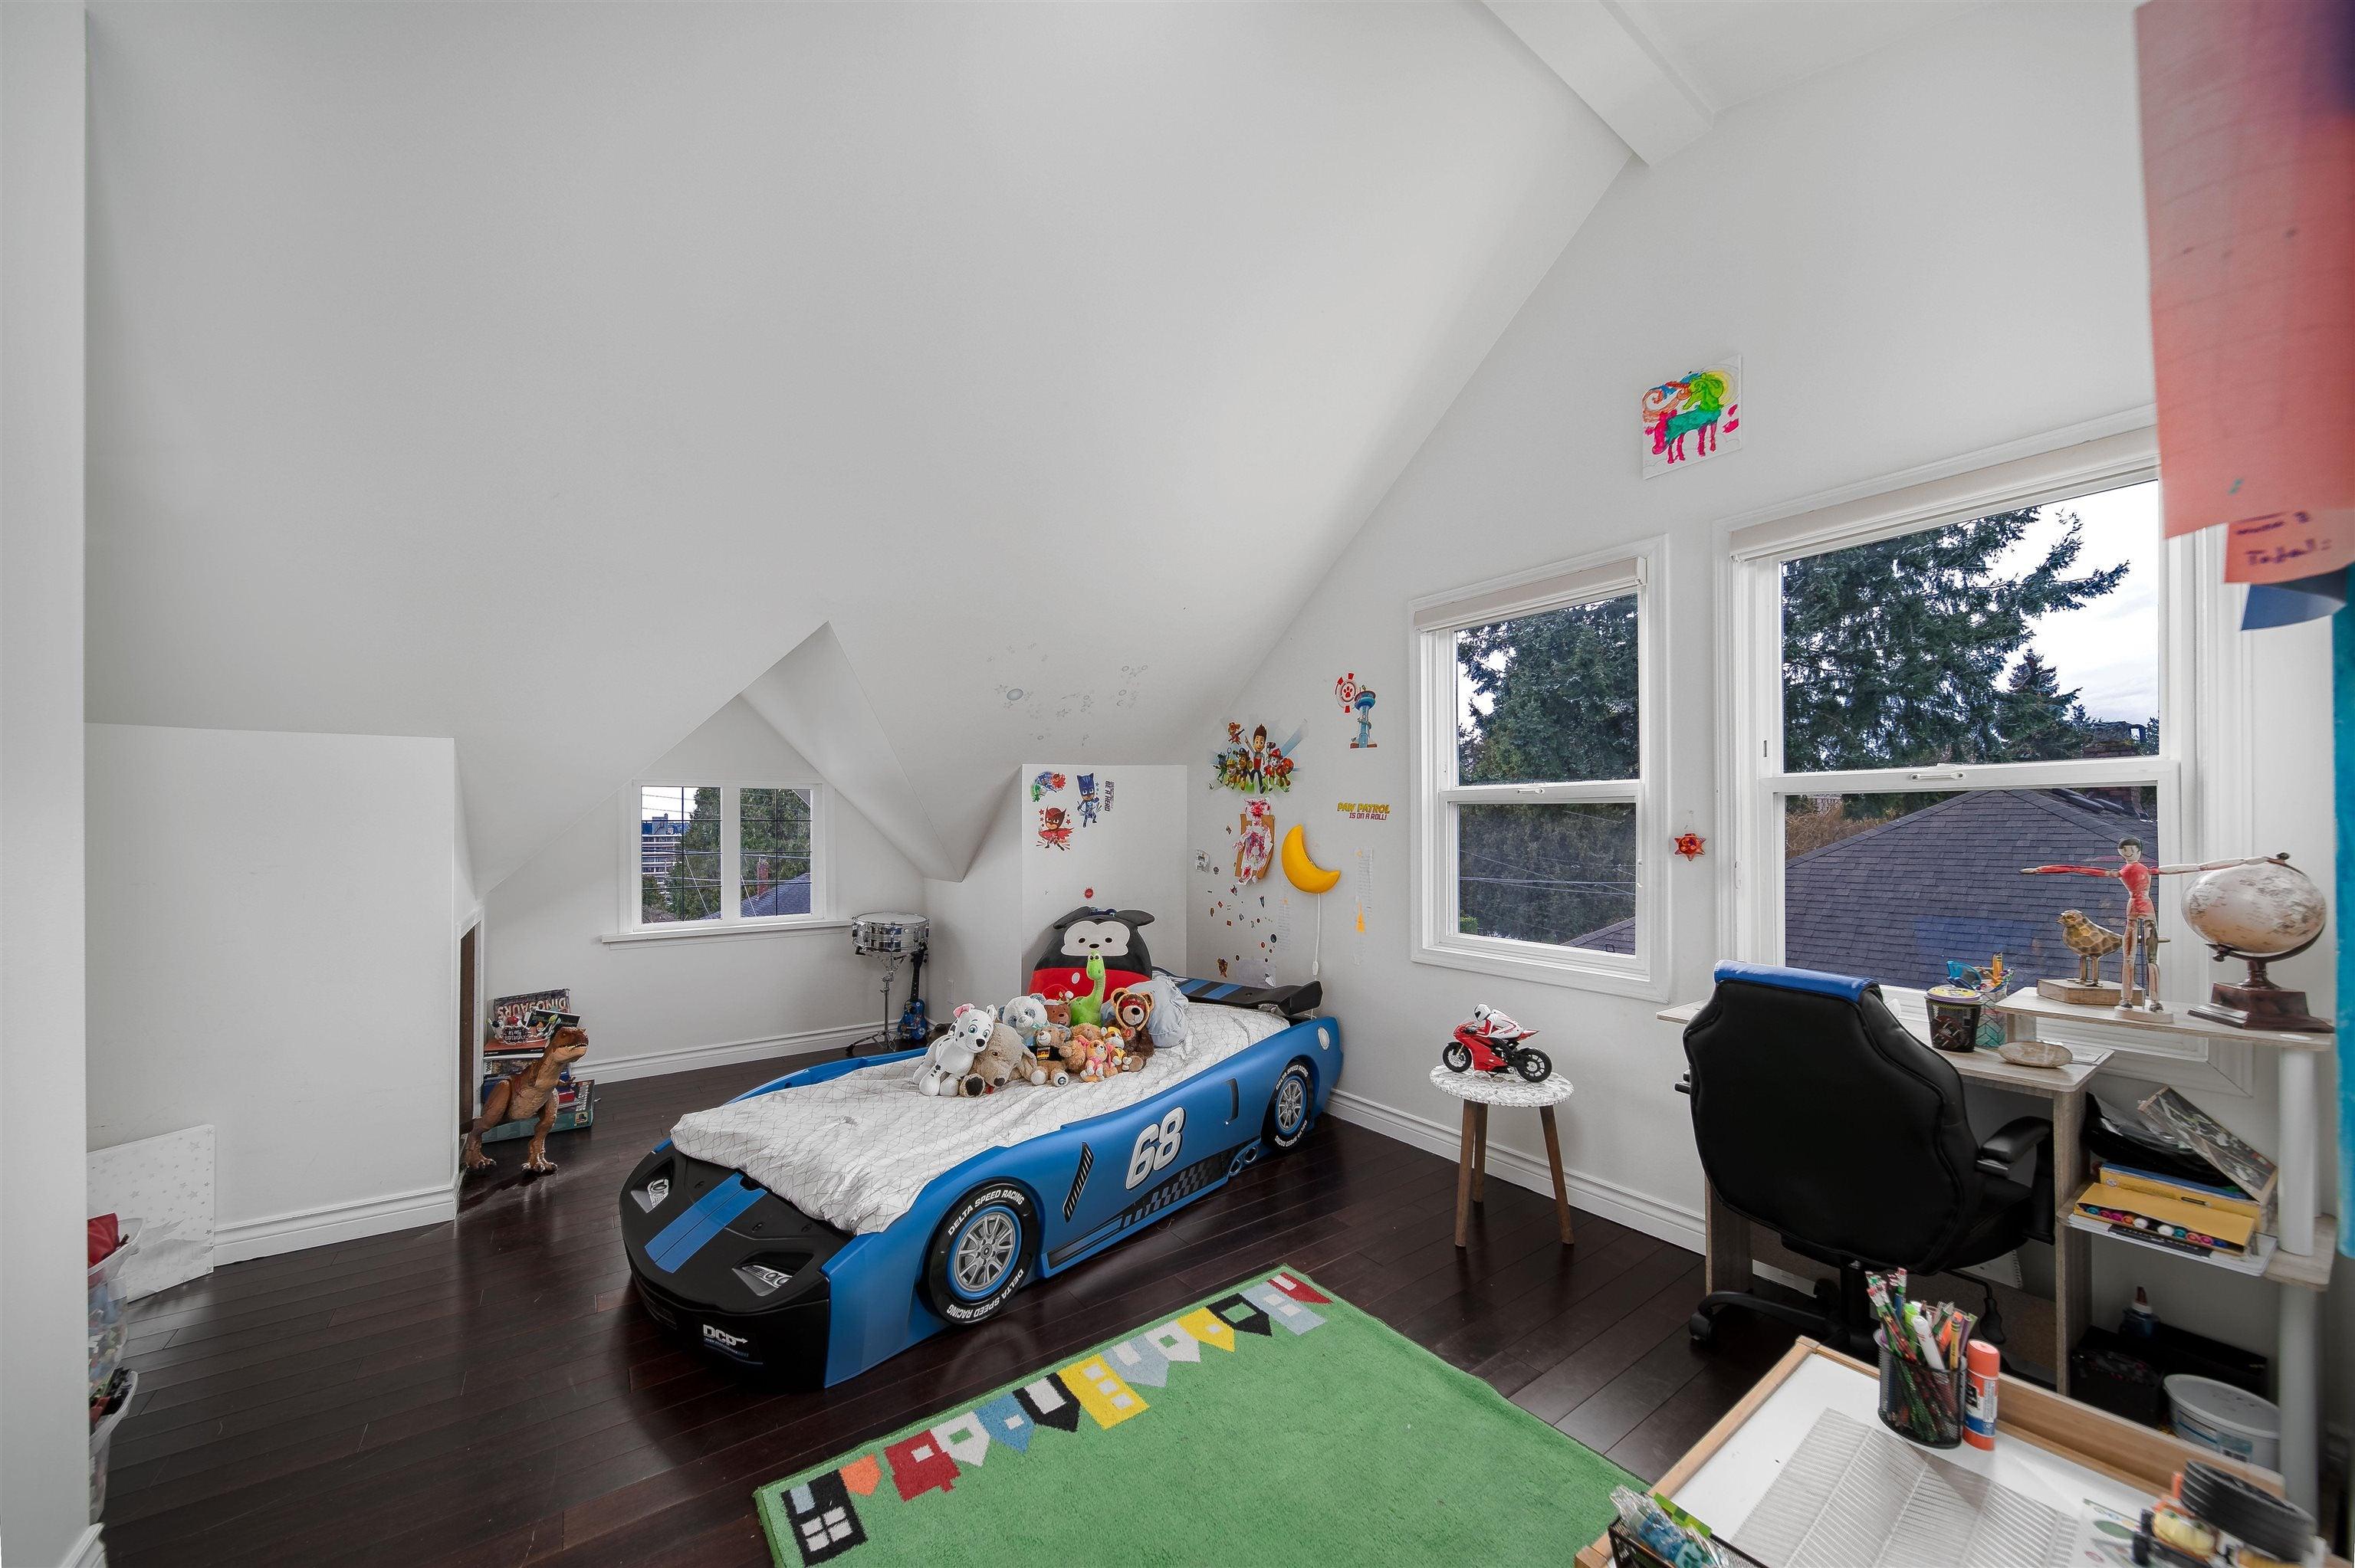 1357 FULTON AVENUE - Ambleside House/Single Family for sale, 6 Bedrooms (R2617731) - #21